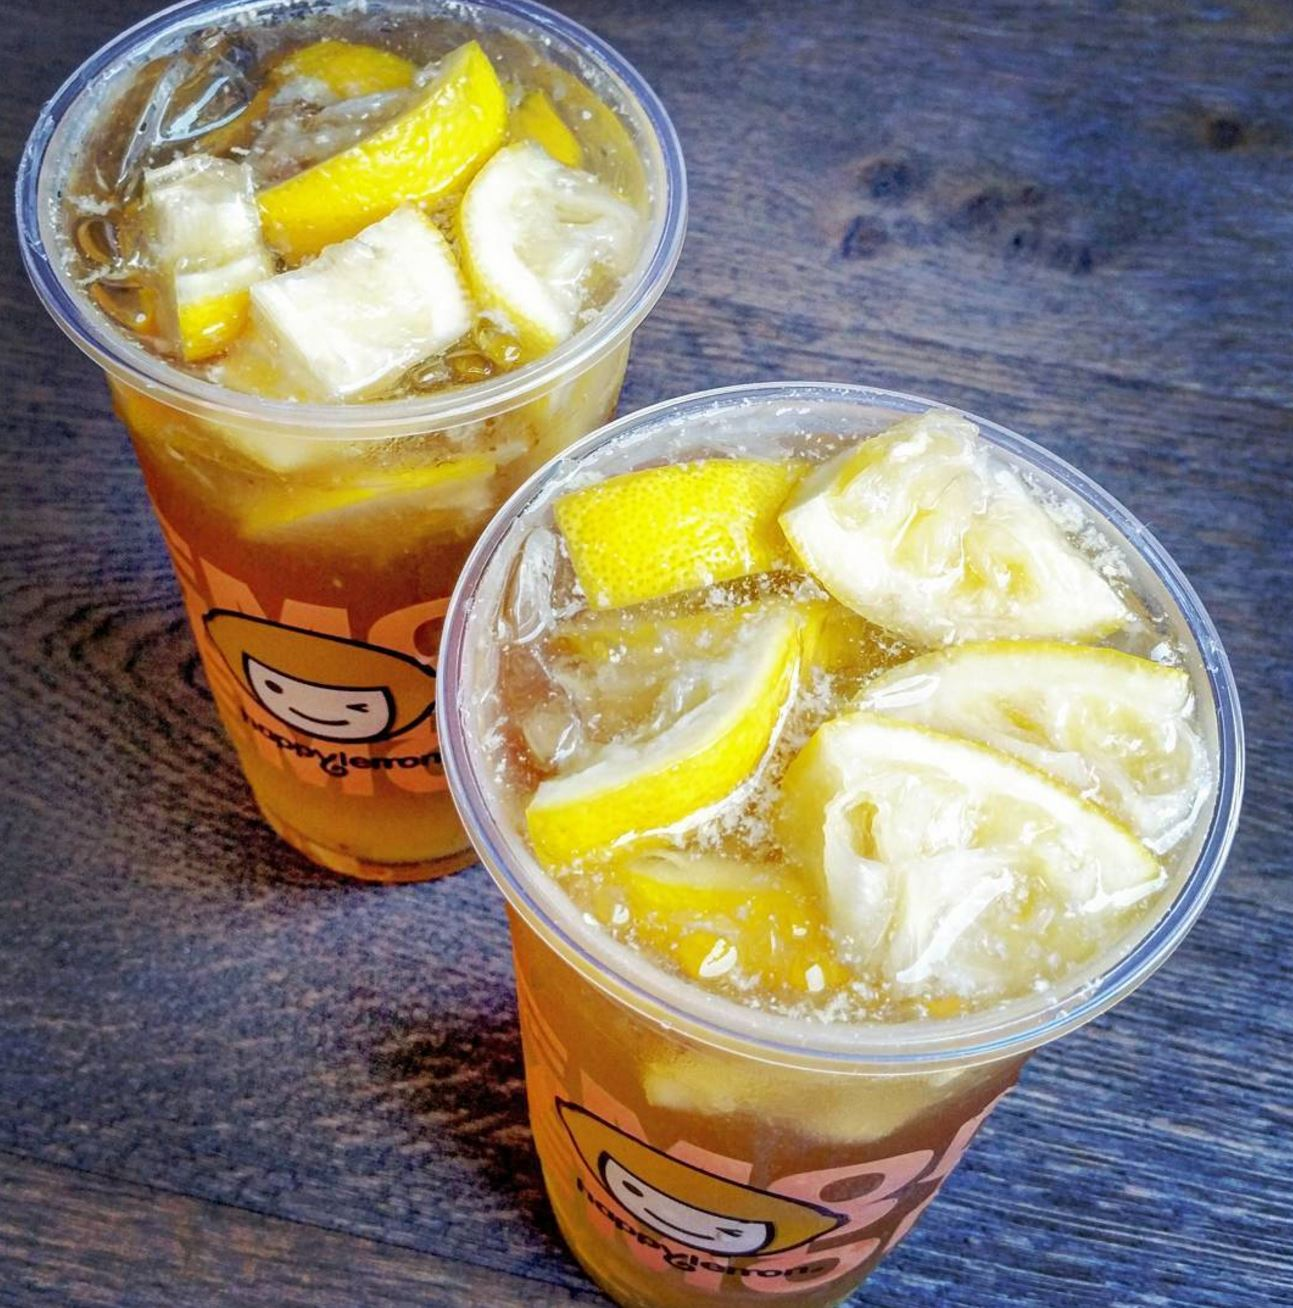 Ends April 16 | Bogo Free Freshly Squeezed Lemon Teas From Sunmerry Bakery